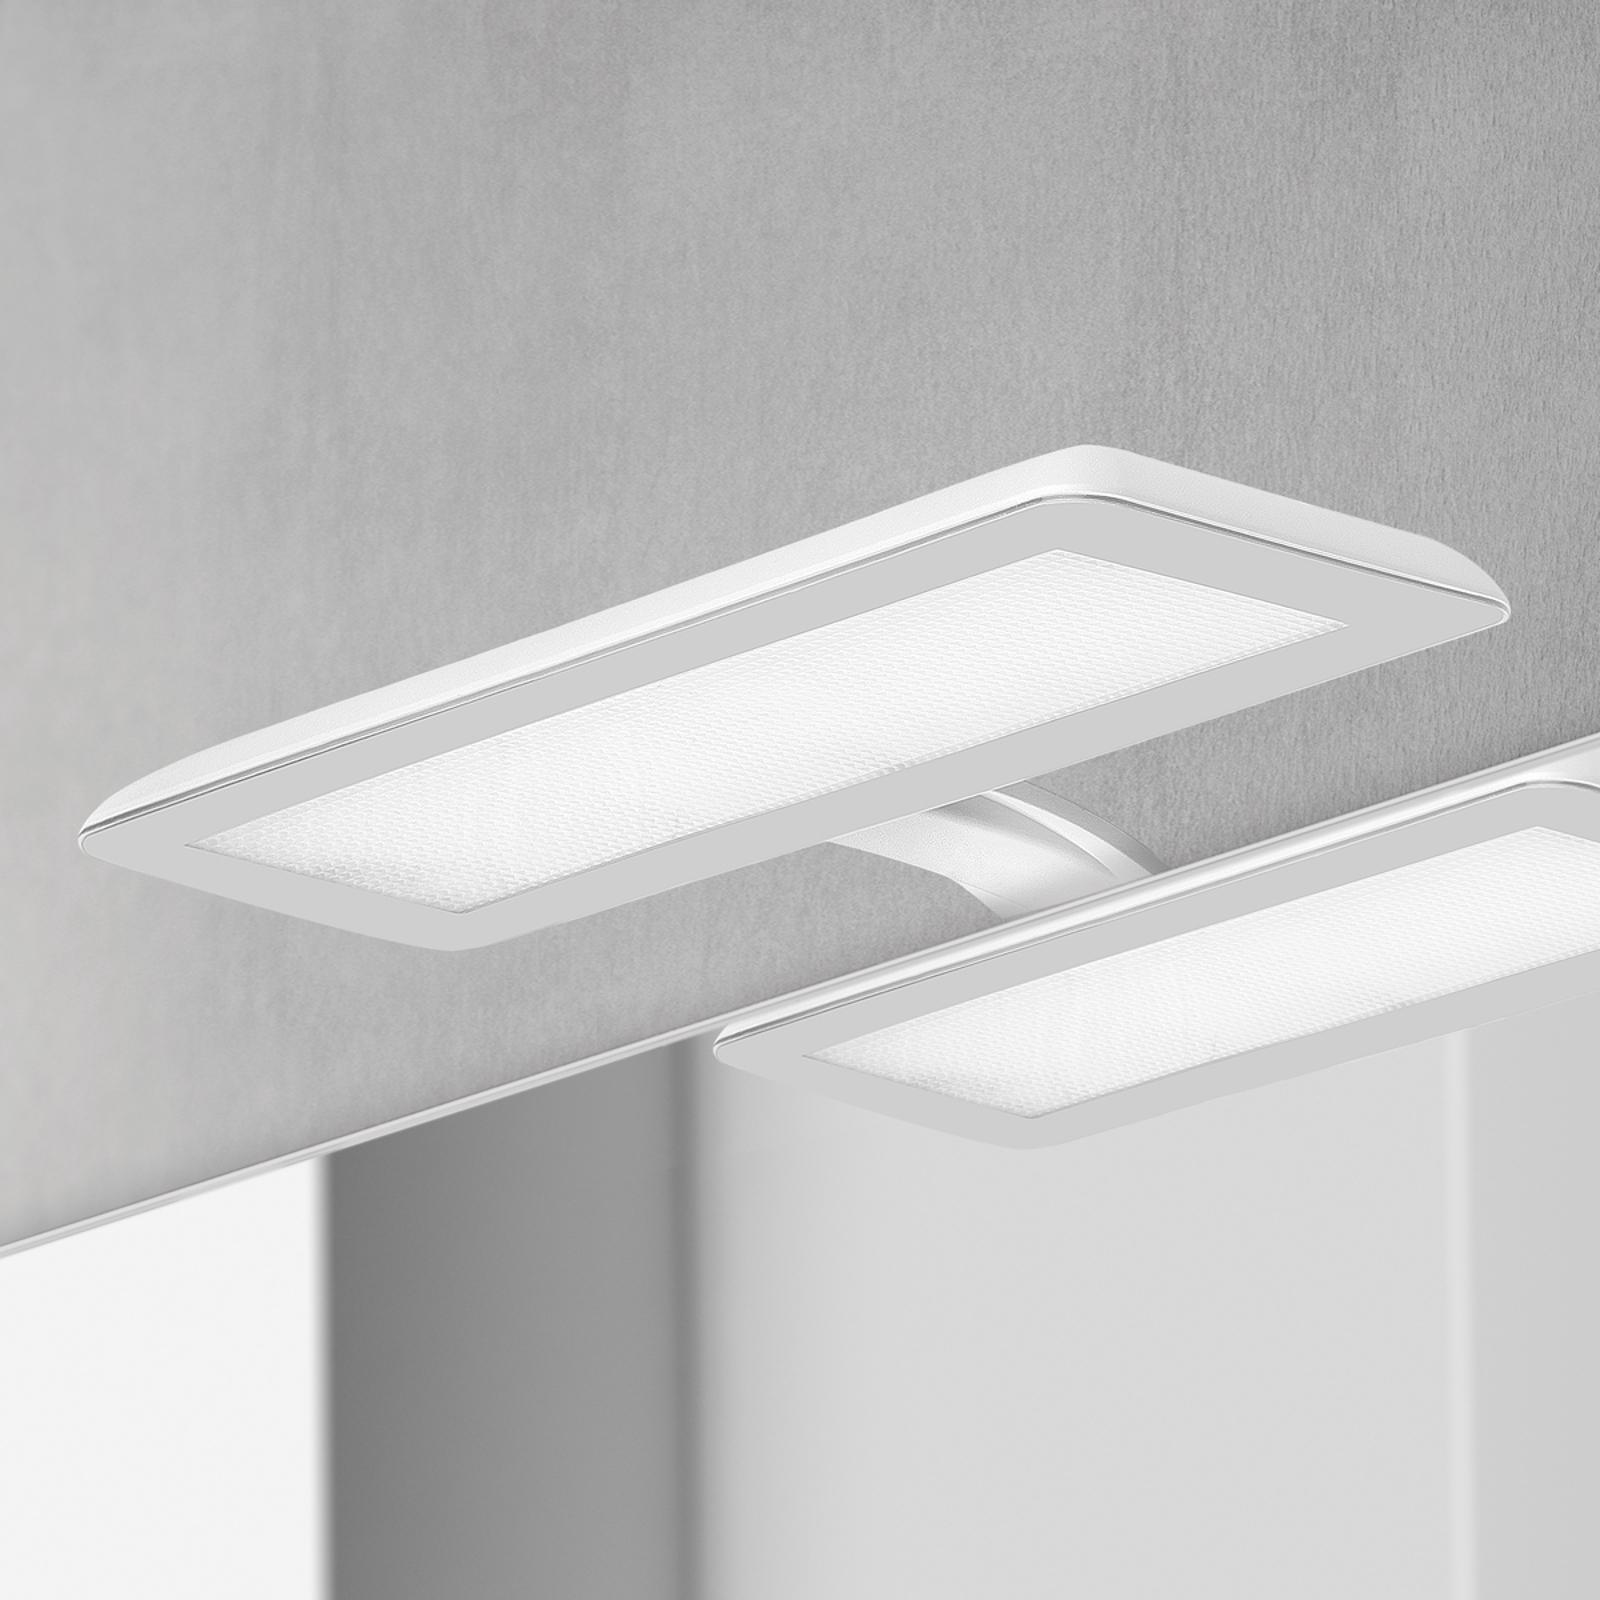 LED-spegellampa Nikita, vit/stålgrå